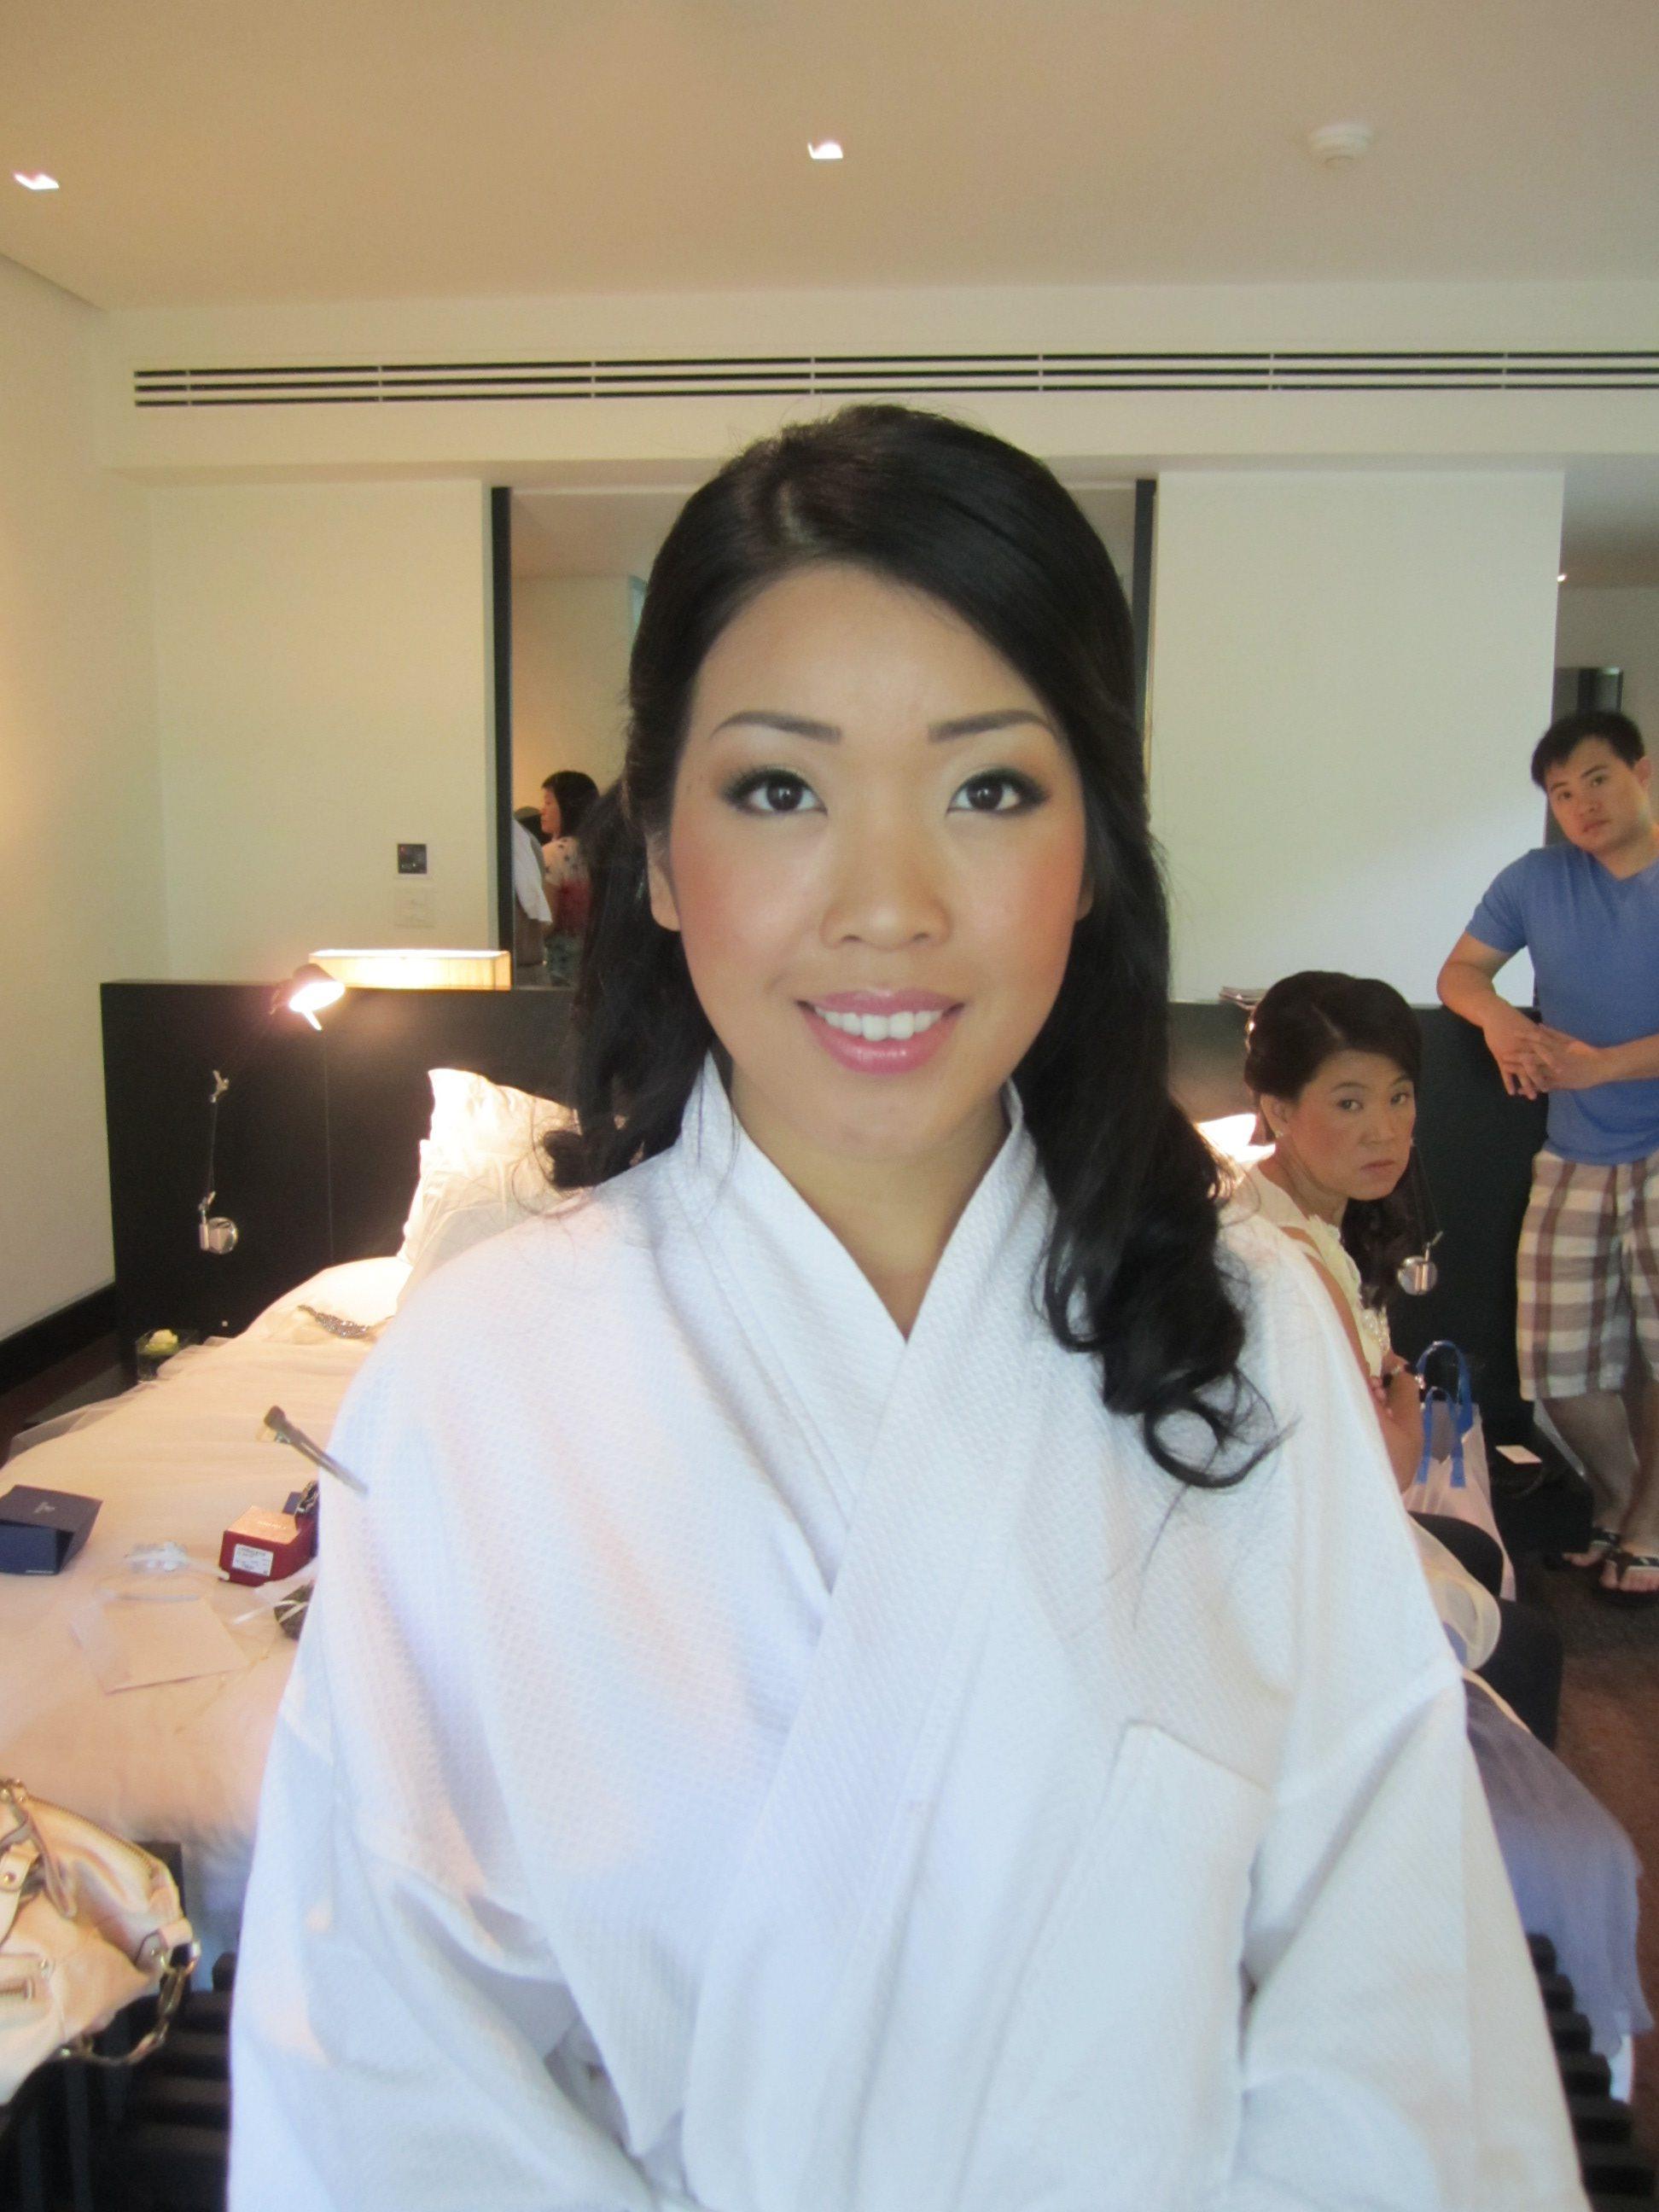 Makeup Artist Hobart Australia